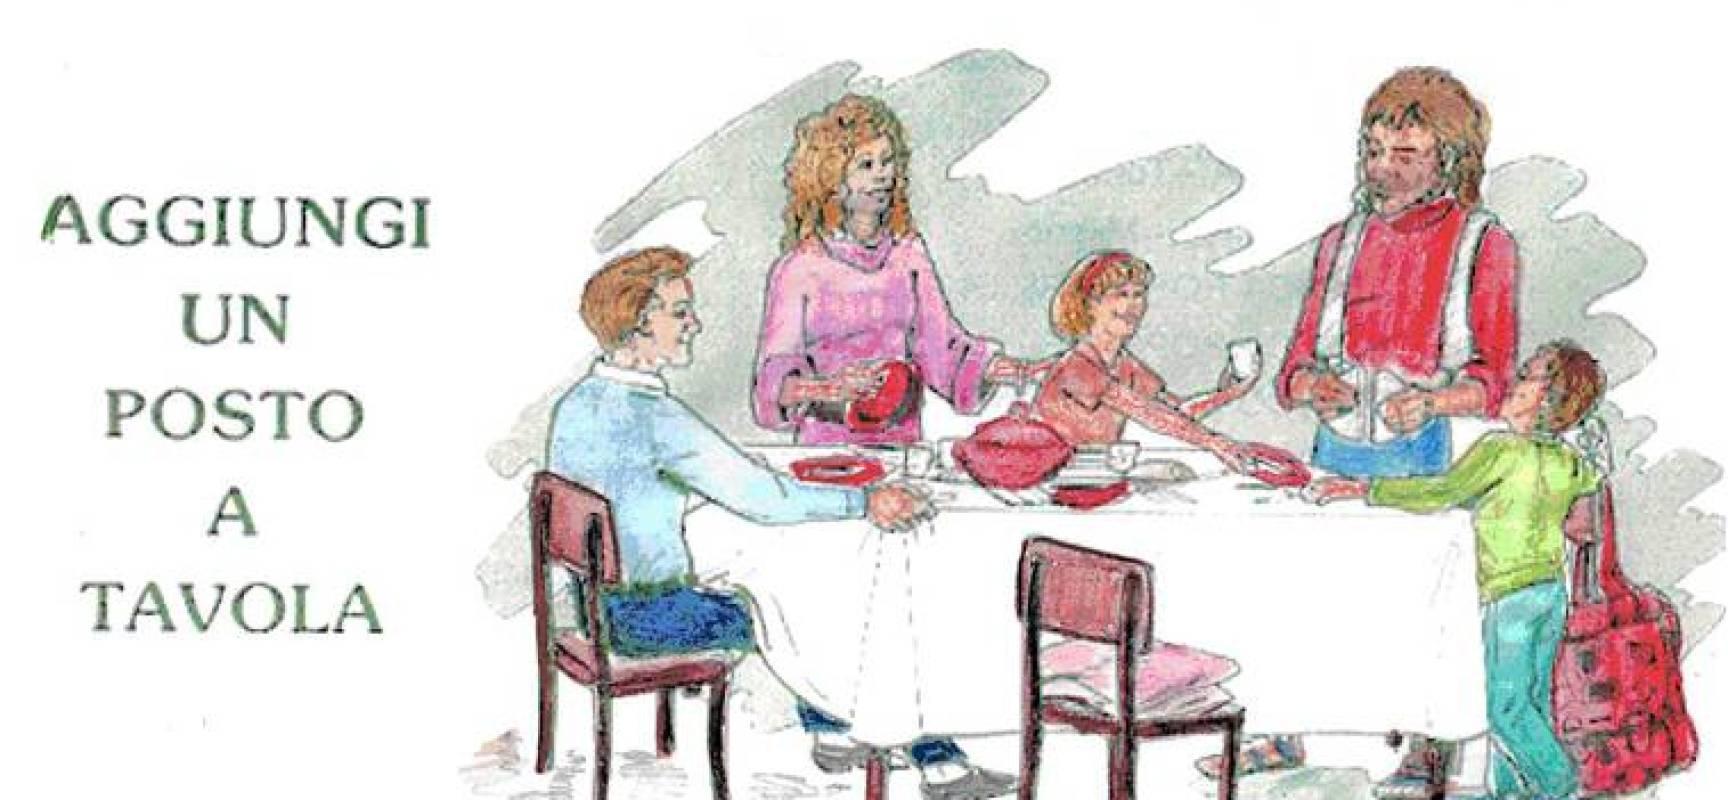 Capannori aggiungi un posto a tavola 39 verde azzurro notizie - Aggiungi un posto a tavola ...